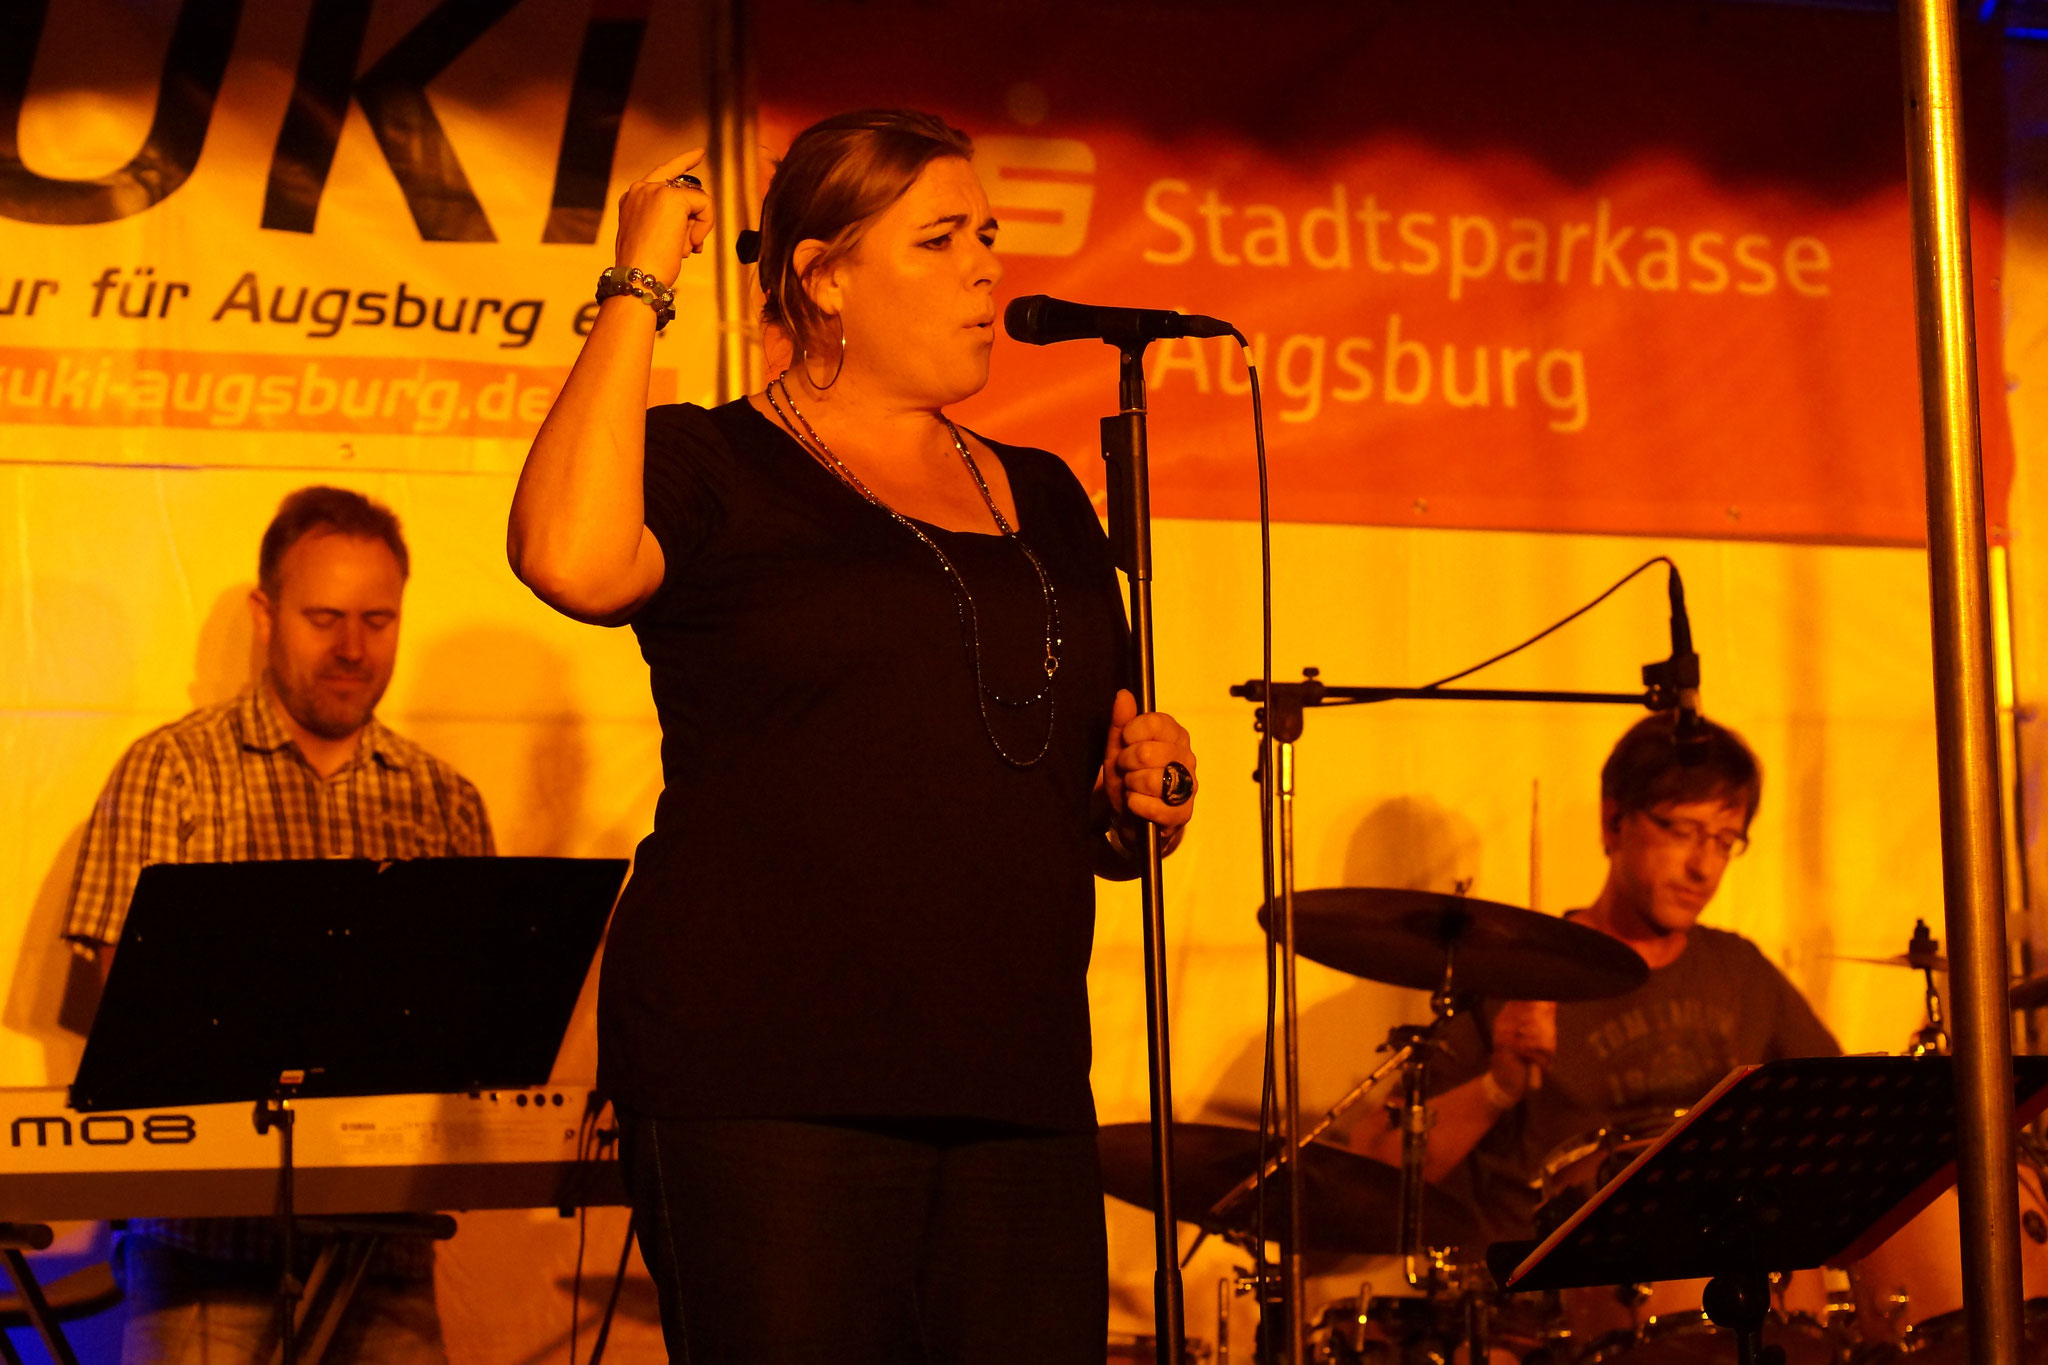 Konzerte im Bürgerhof 09.07.16 wakafunka - Freiwilligen-Zentrum Augsburg - Foto: Crayfish